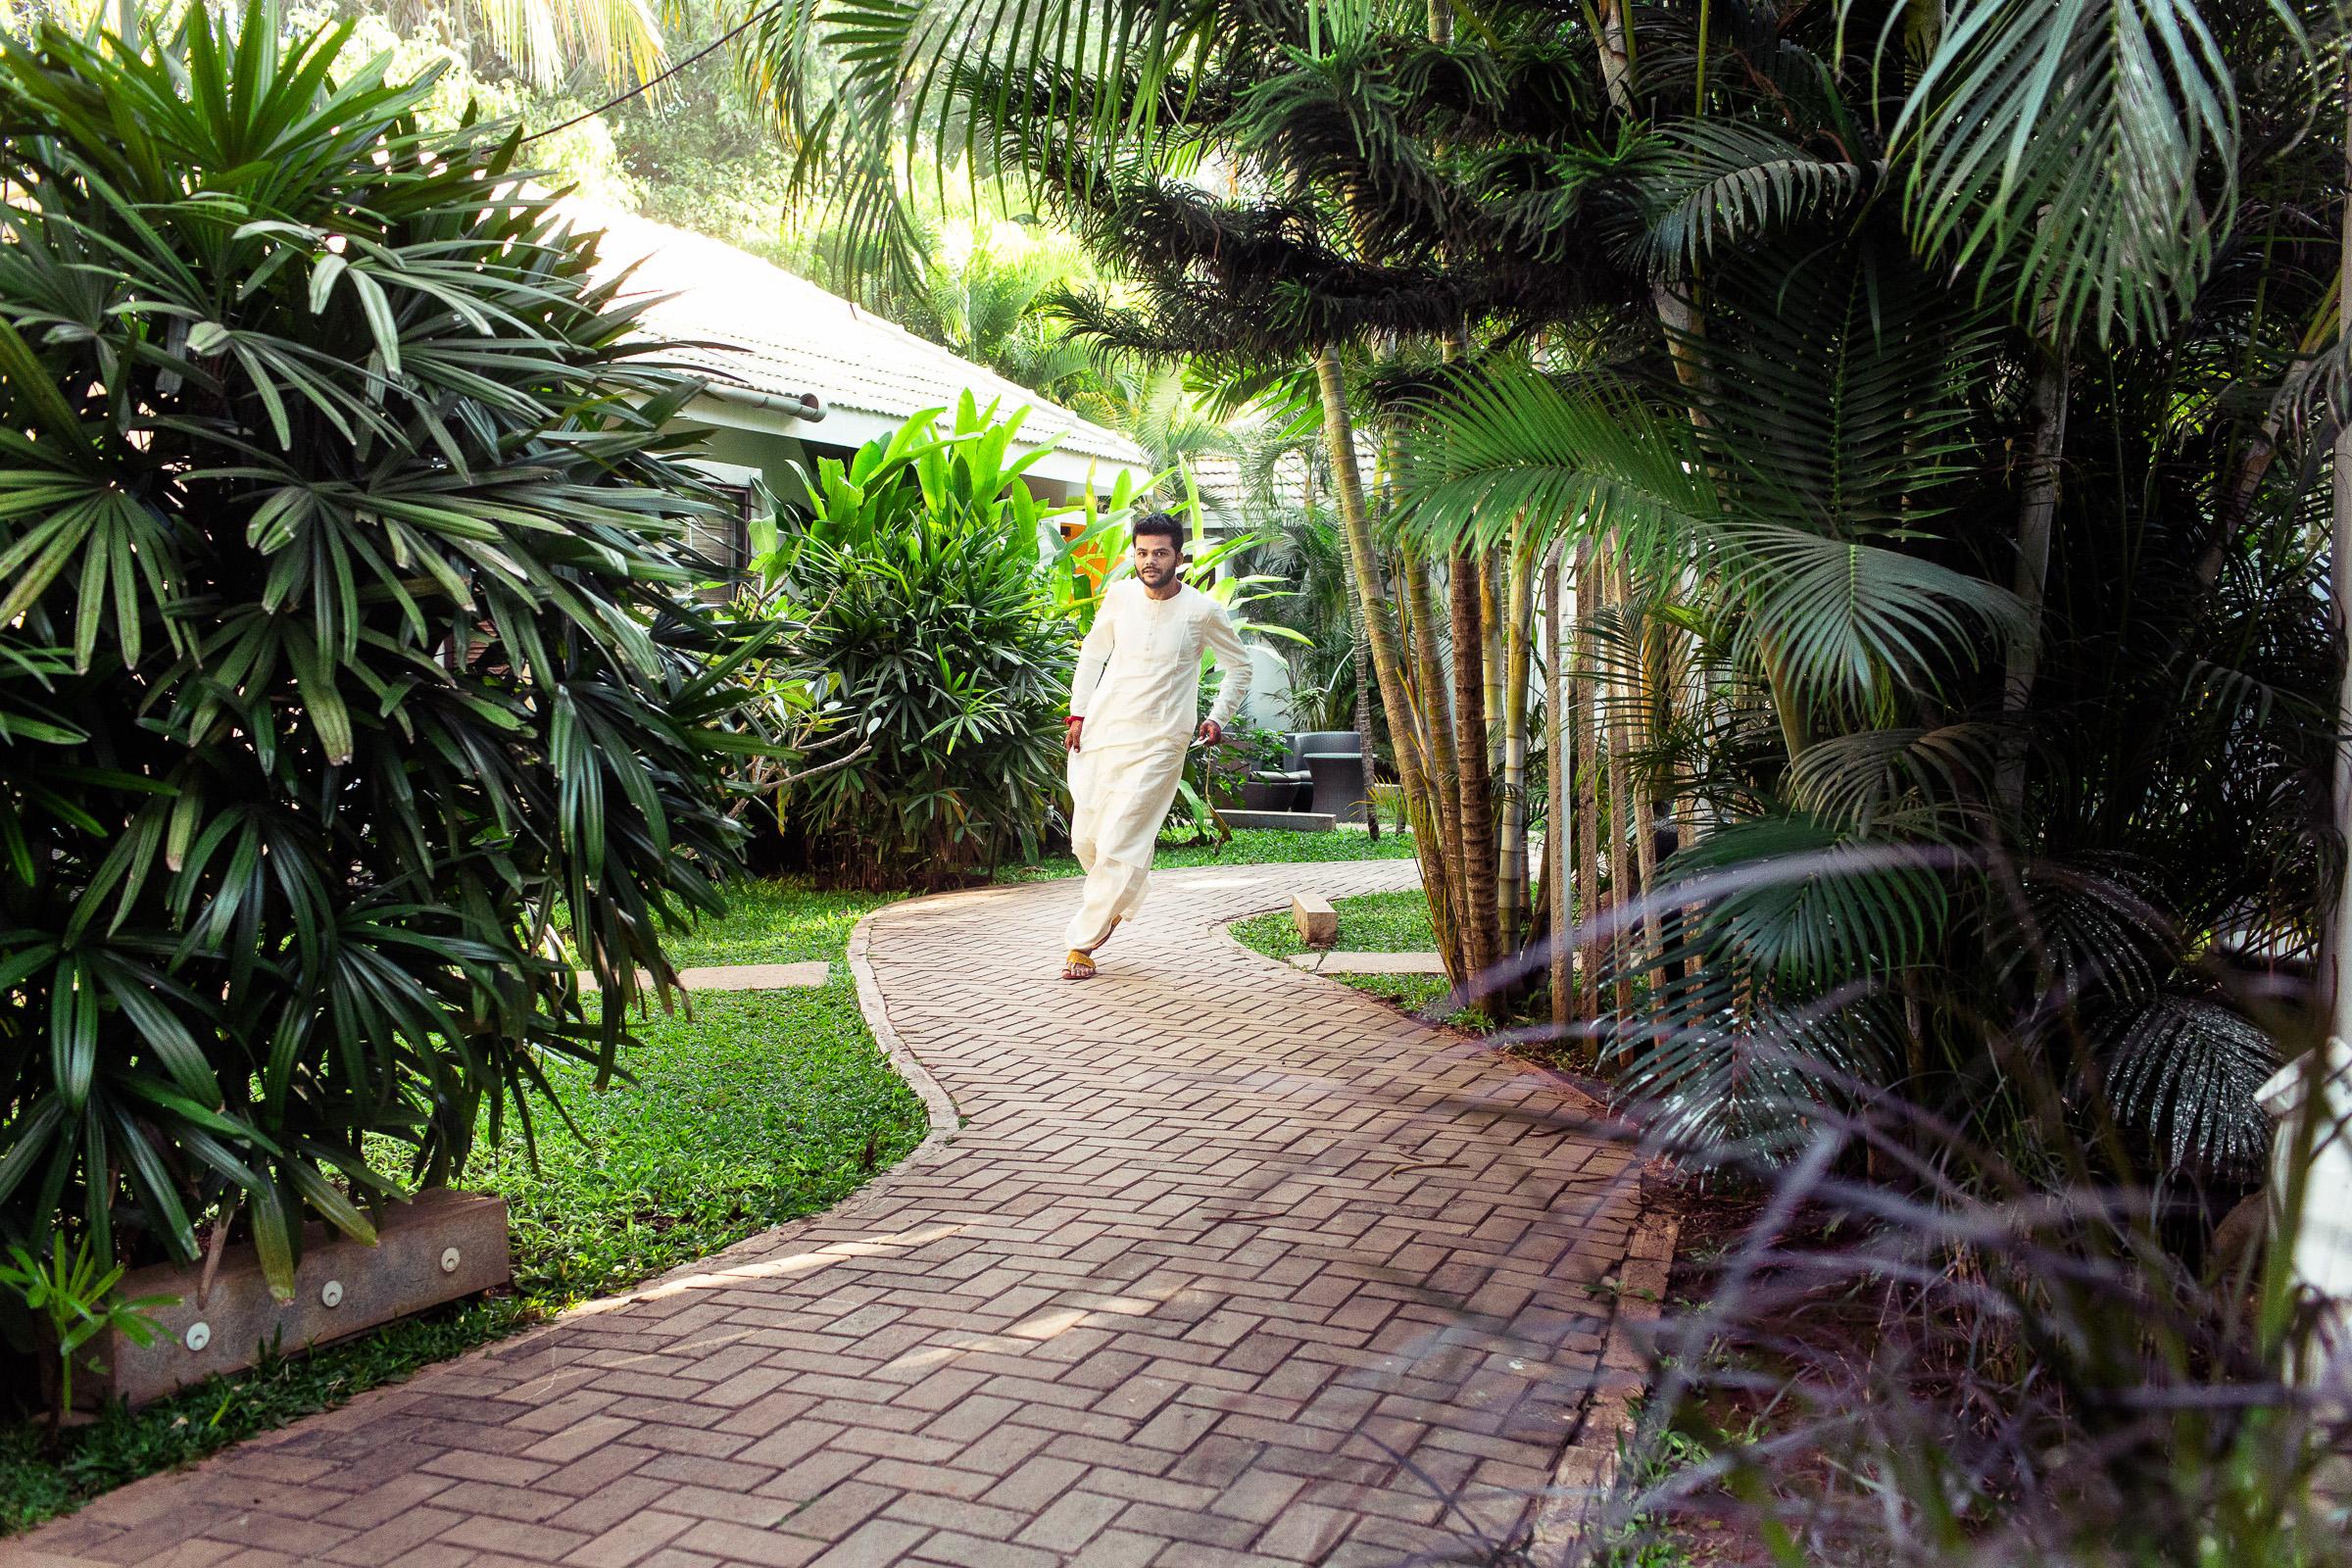 marwari-candid-wedding-photographers-bangalore-0002.jpg